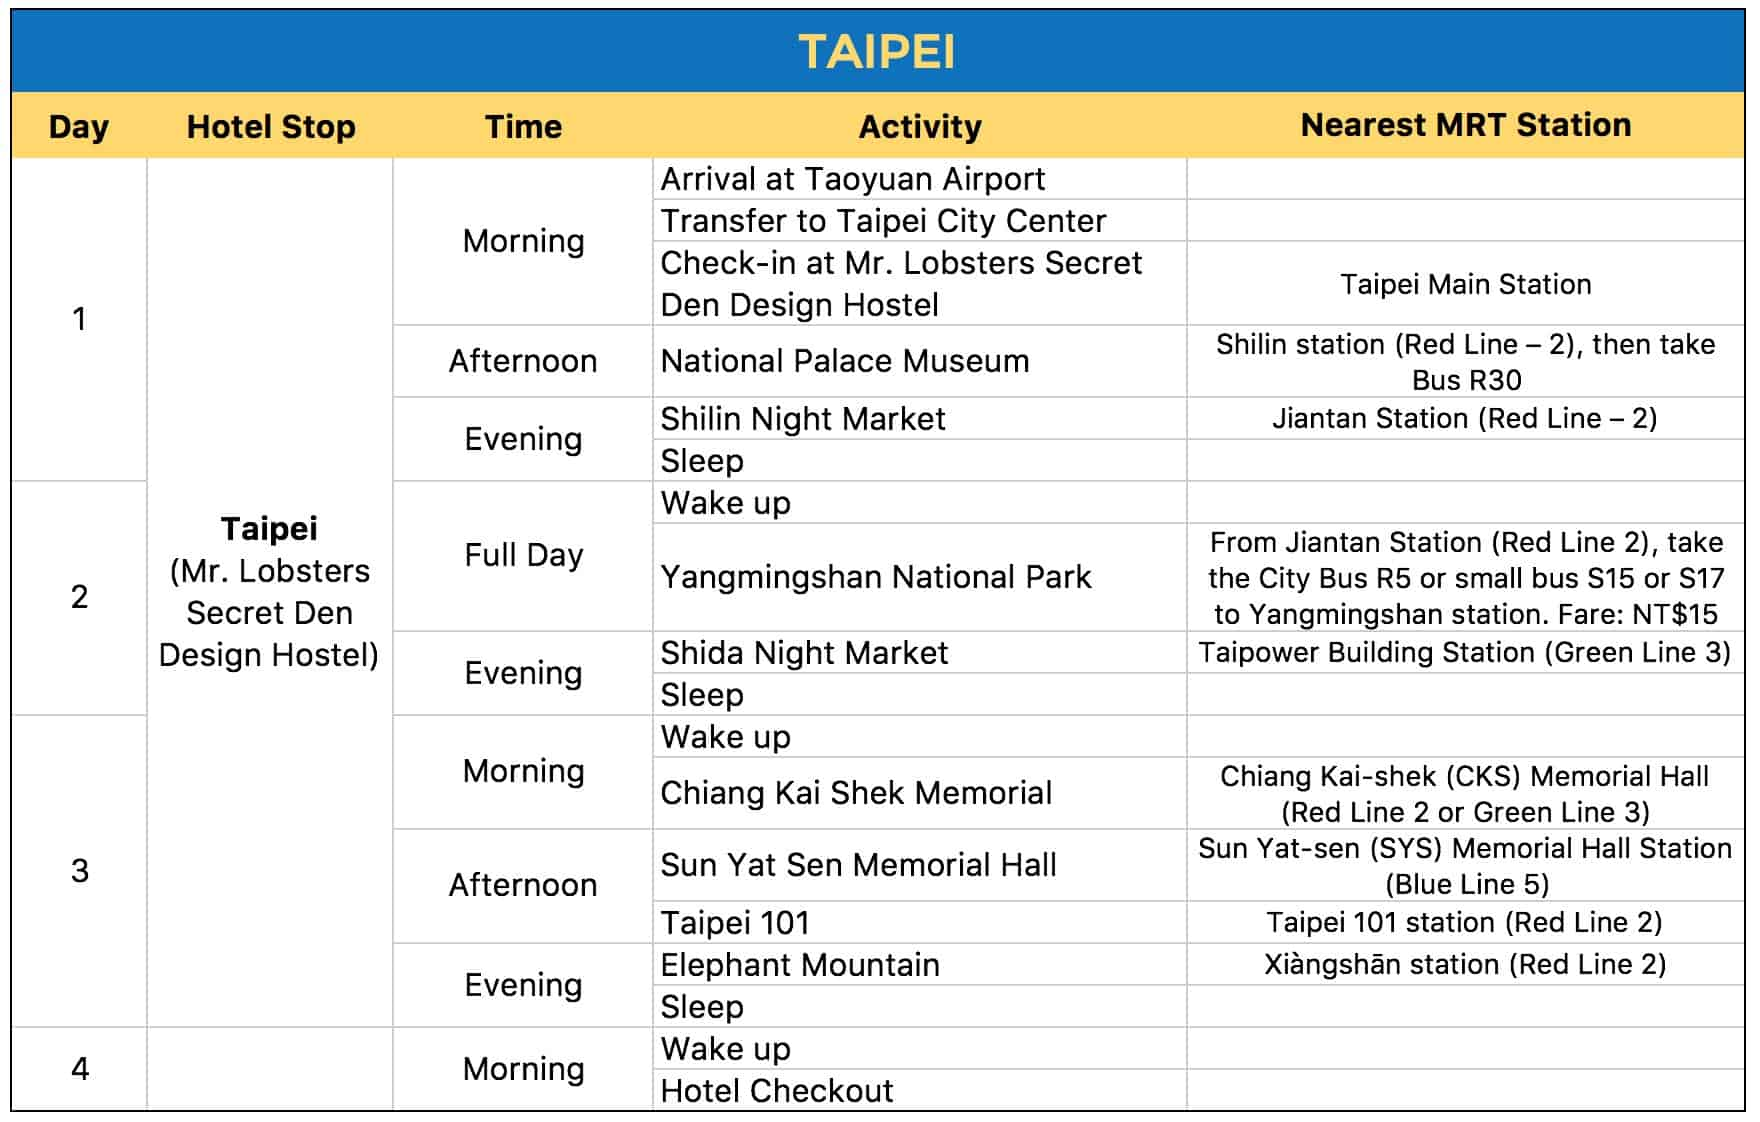 South Island Vacation Day Itinerary